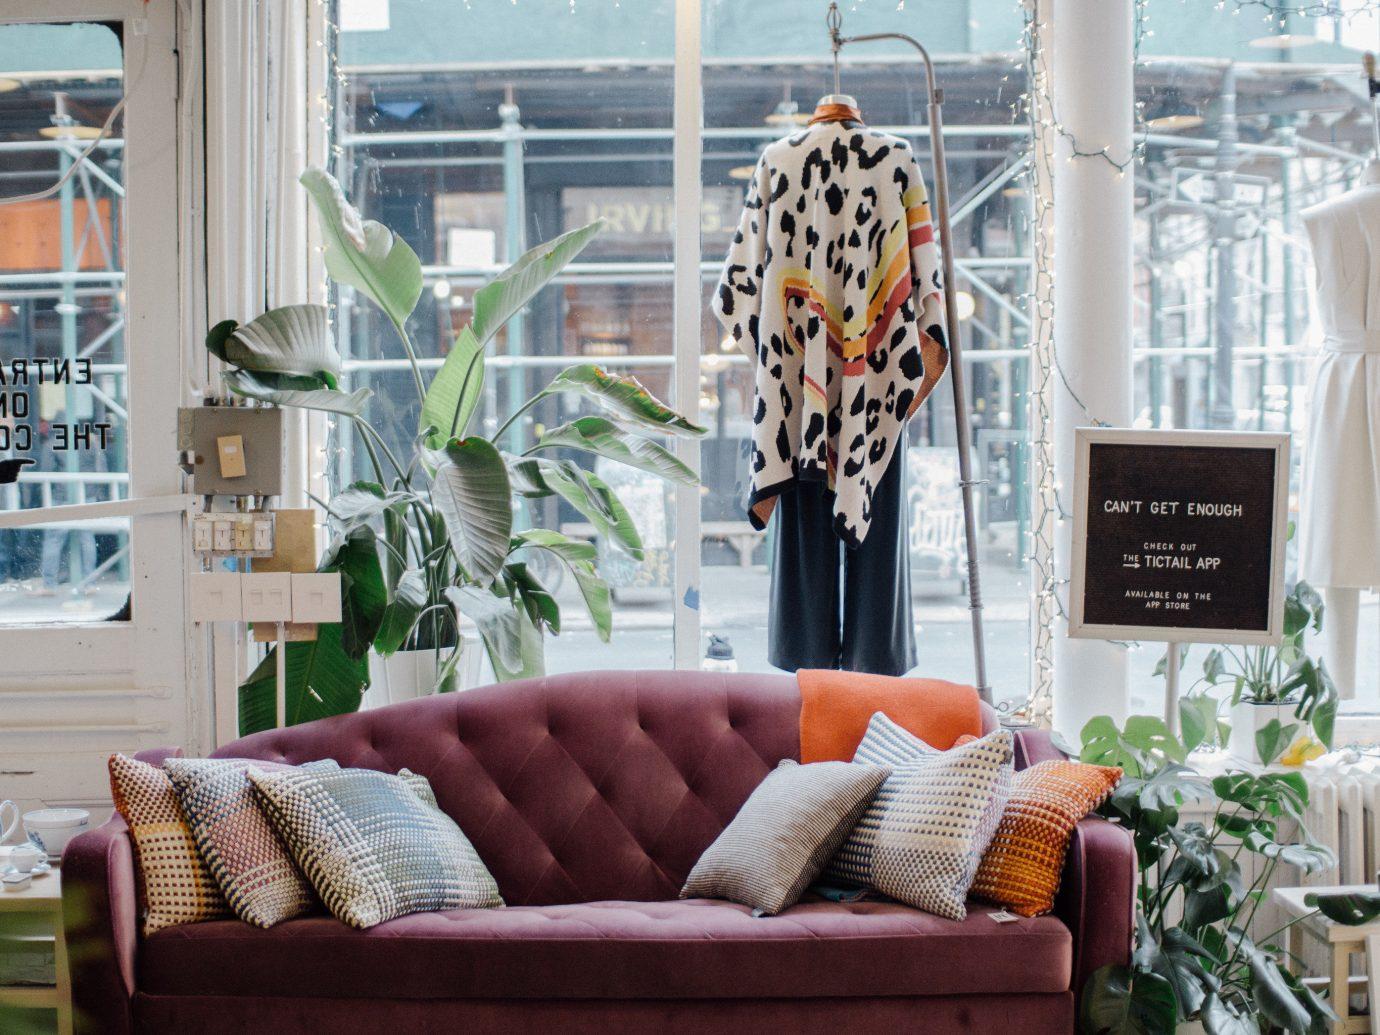 Style + Design Living room living room home interior design furniture Design window covering decorated area